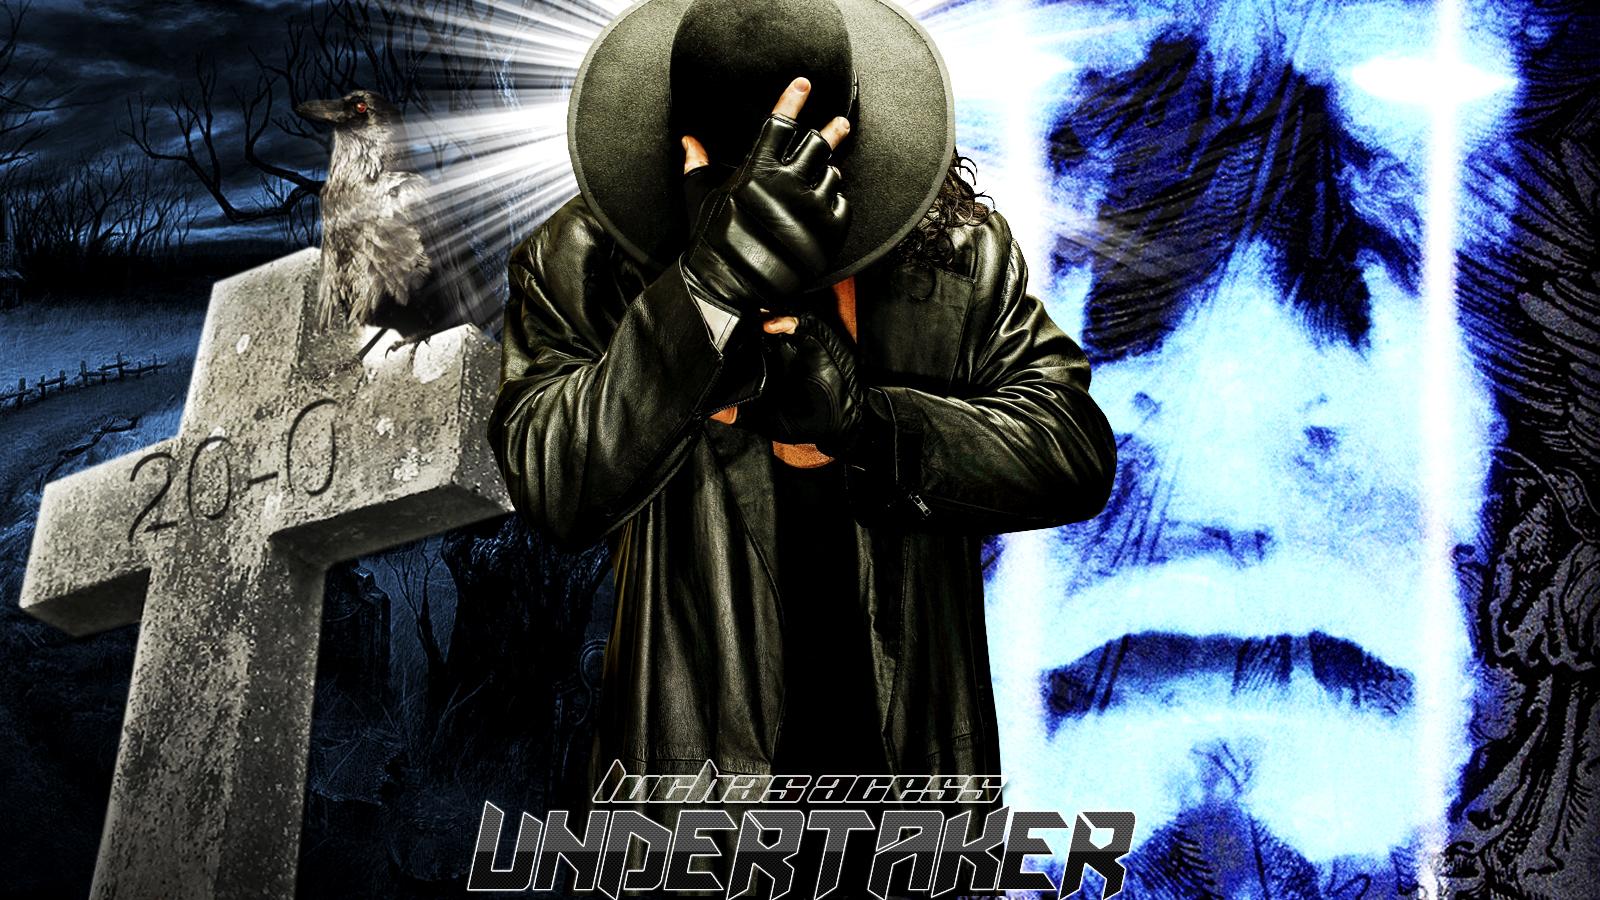 Wallpaper The Undertaker 2012Undertaker Wallpaper 2012